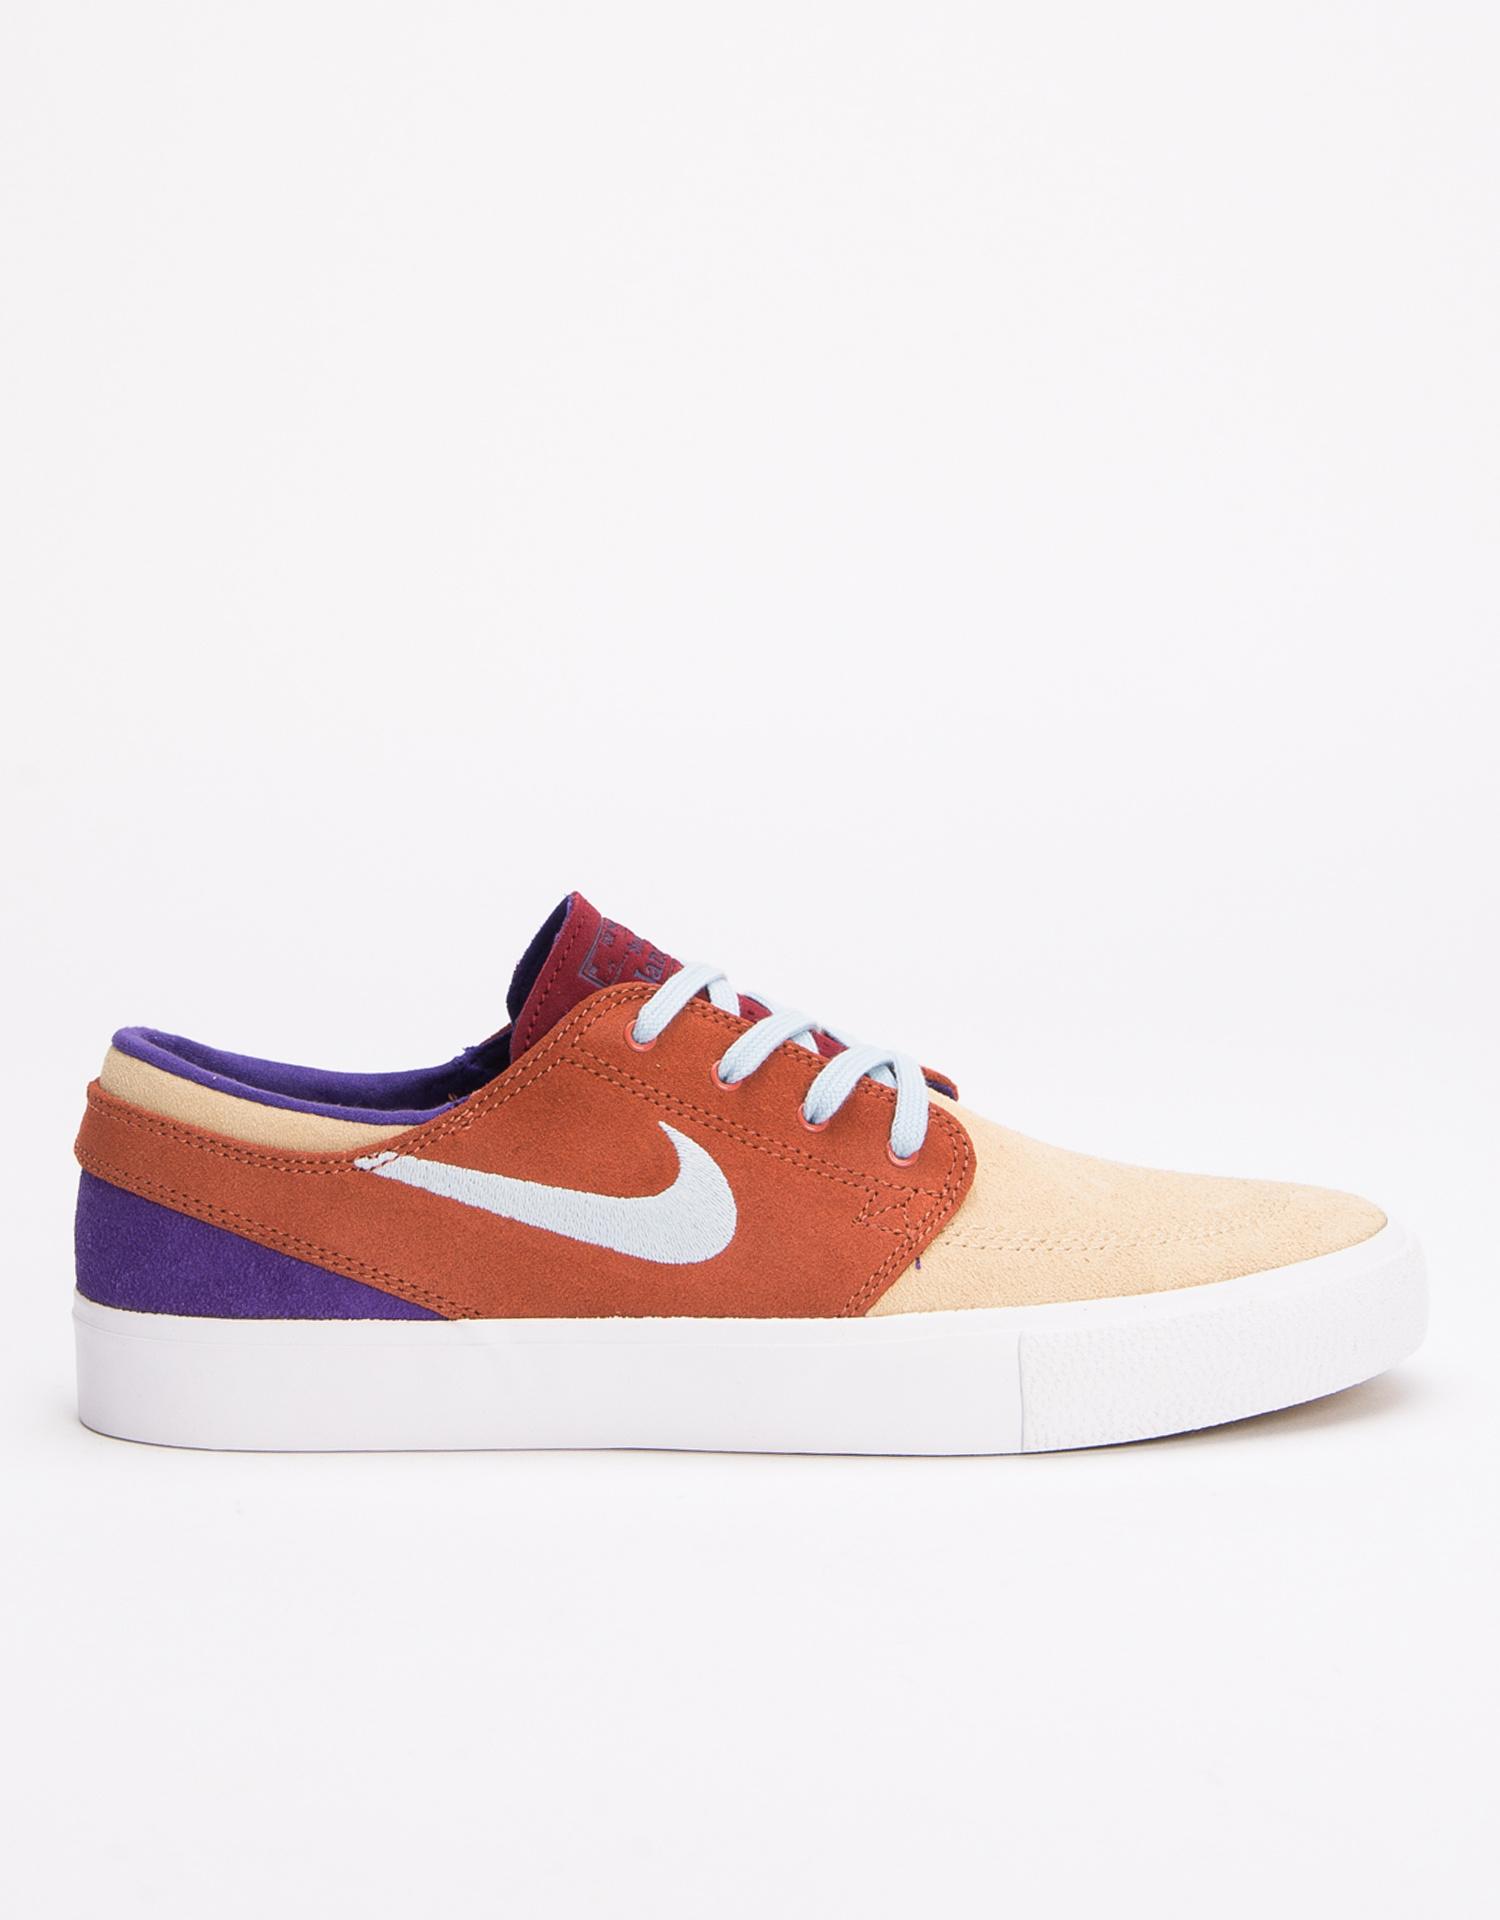 Nike SB Zoom Janoski RM desert ore/lt armory blue-dusty peach